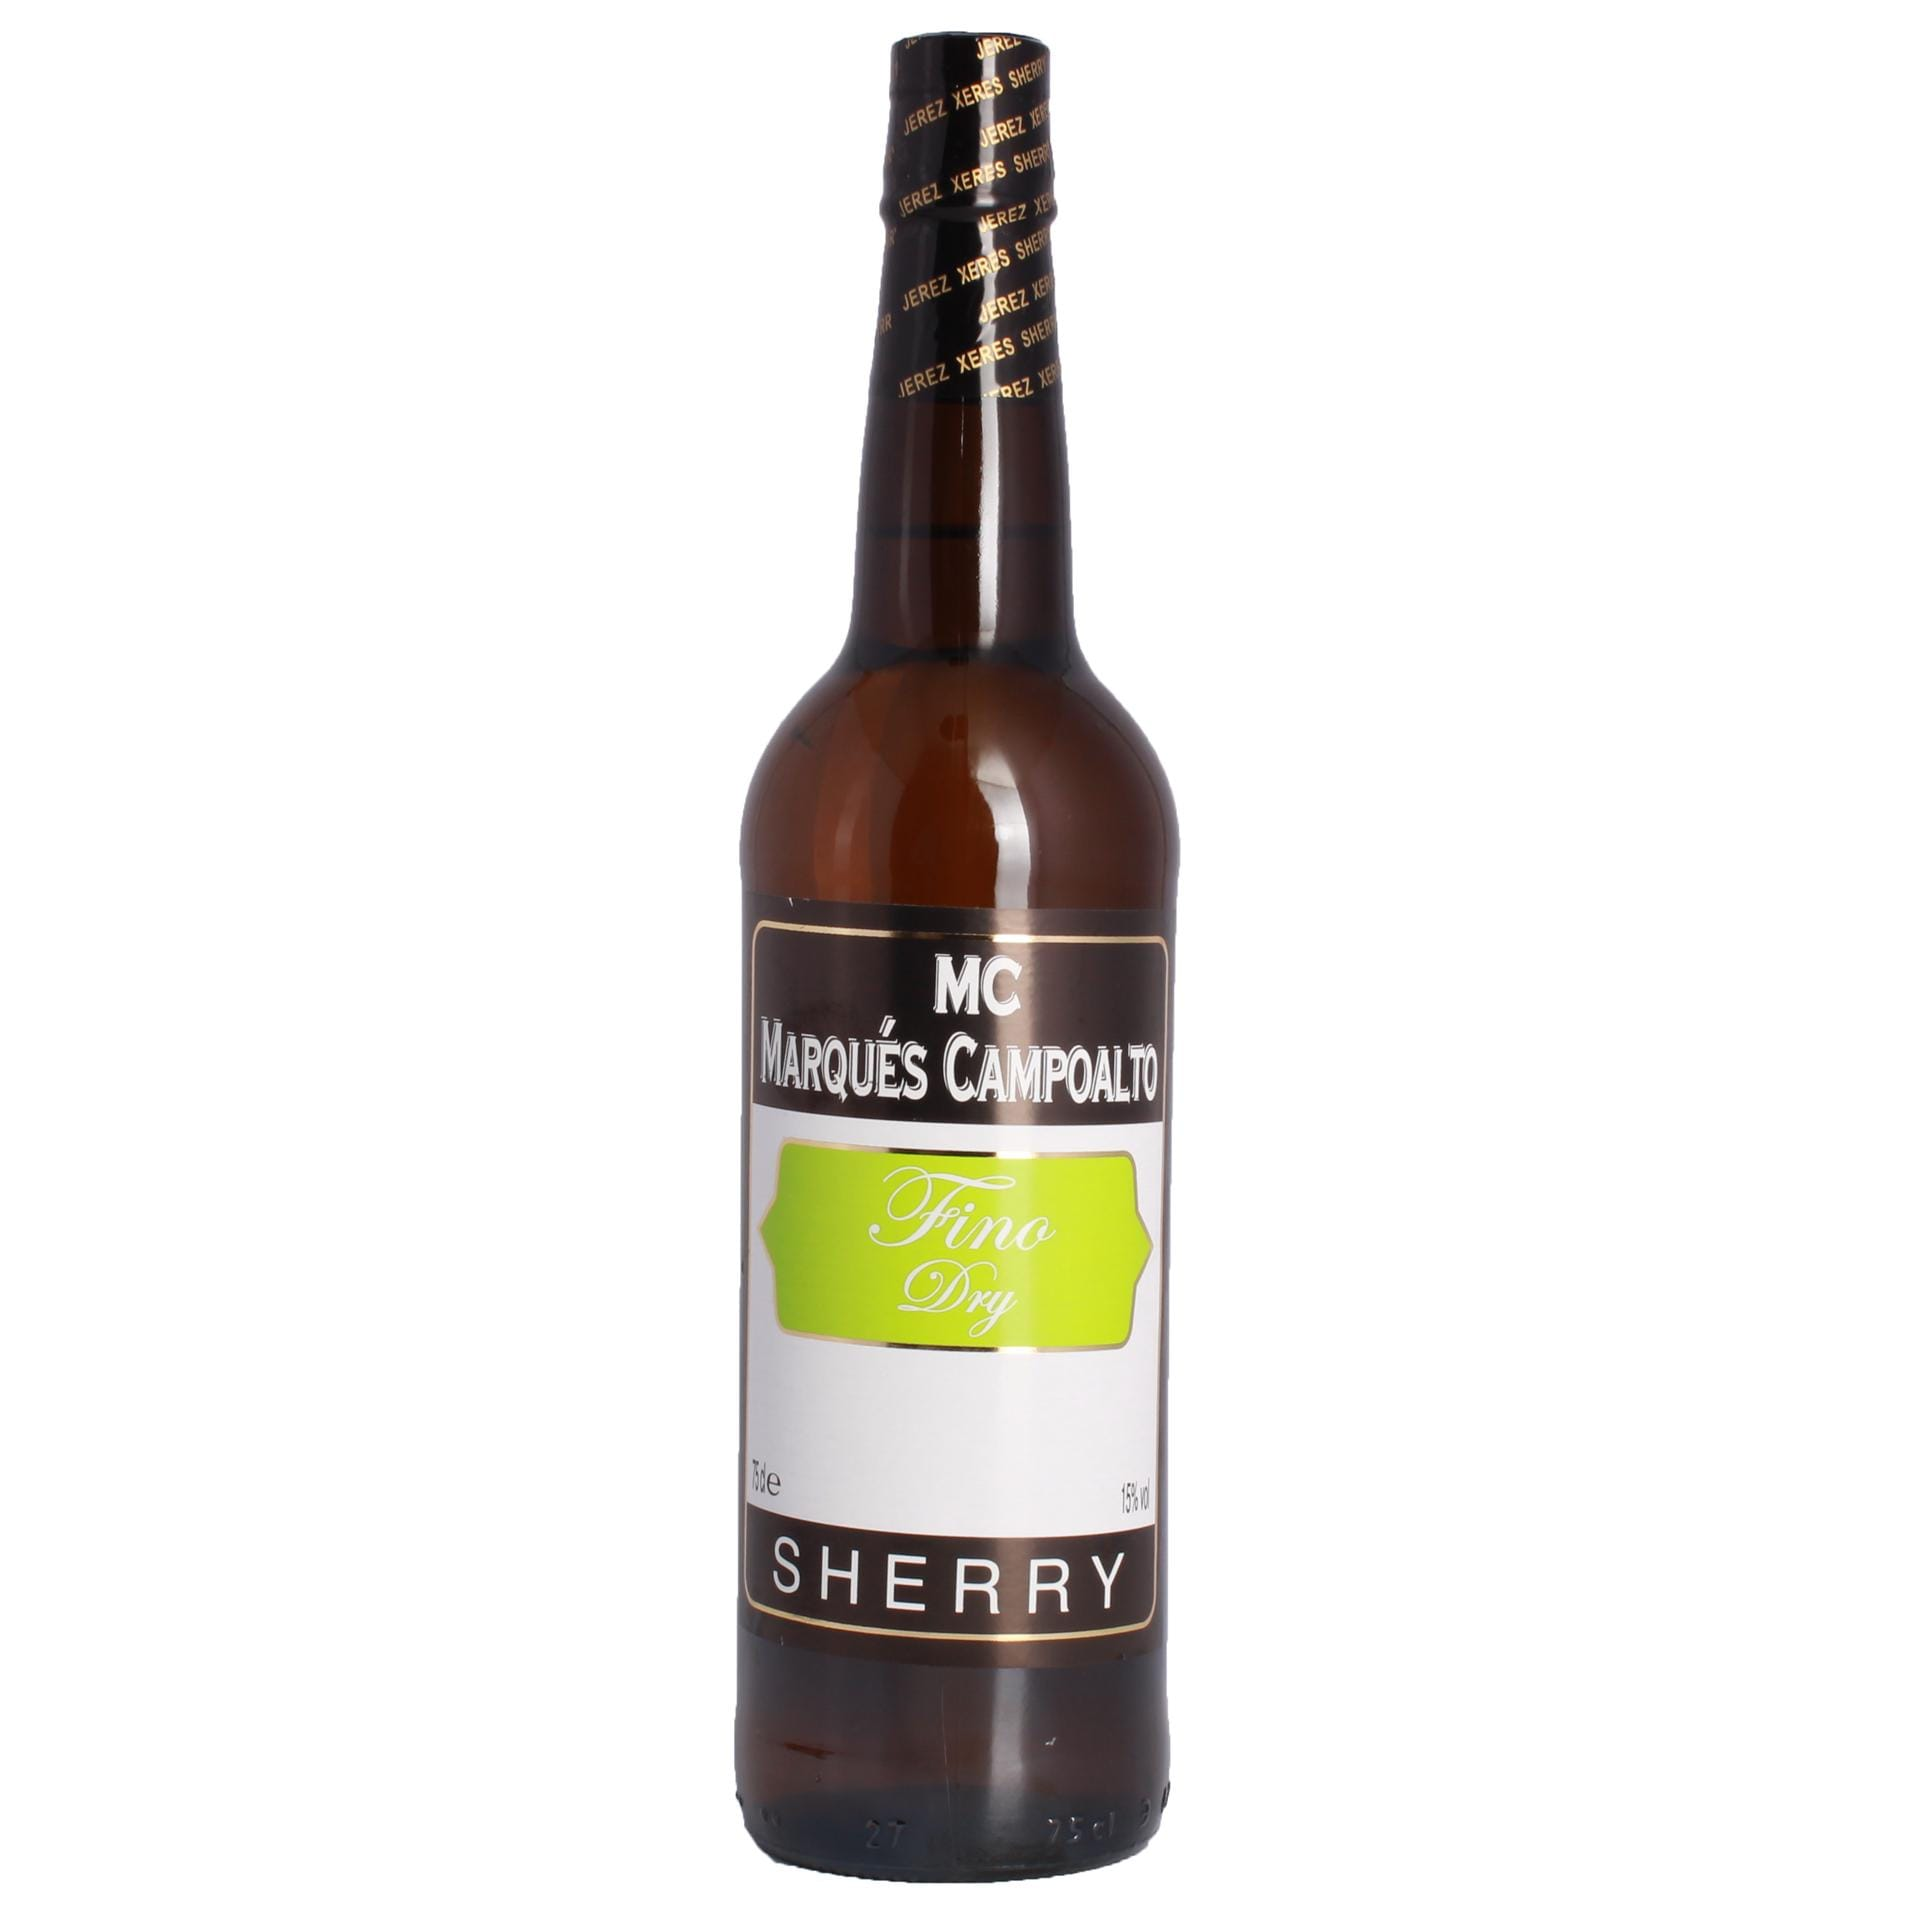 Marqués Campoalto Sherry Fino Dry 15% 0,75l